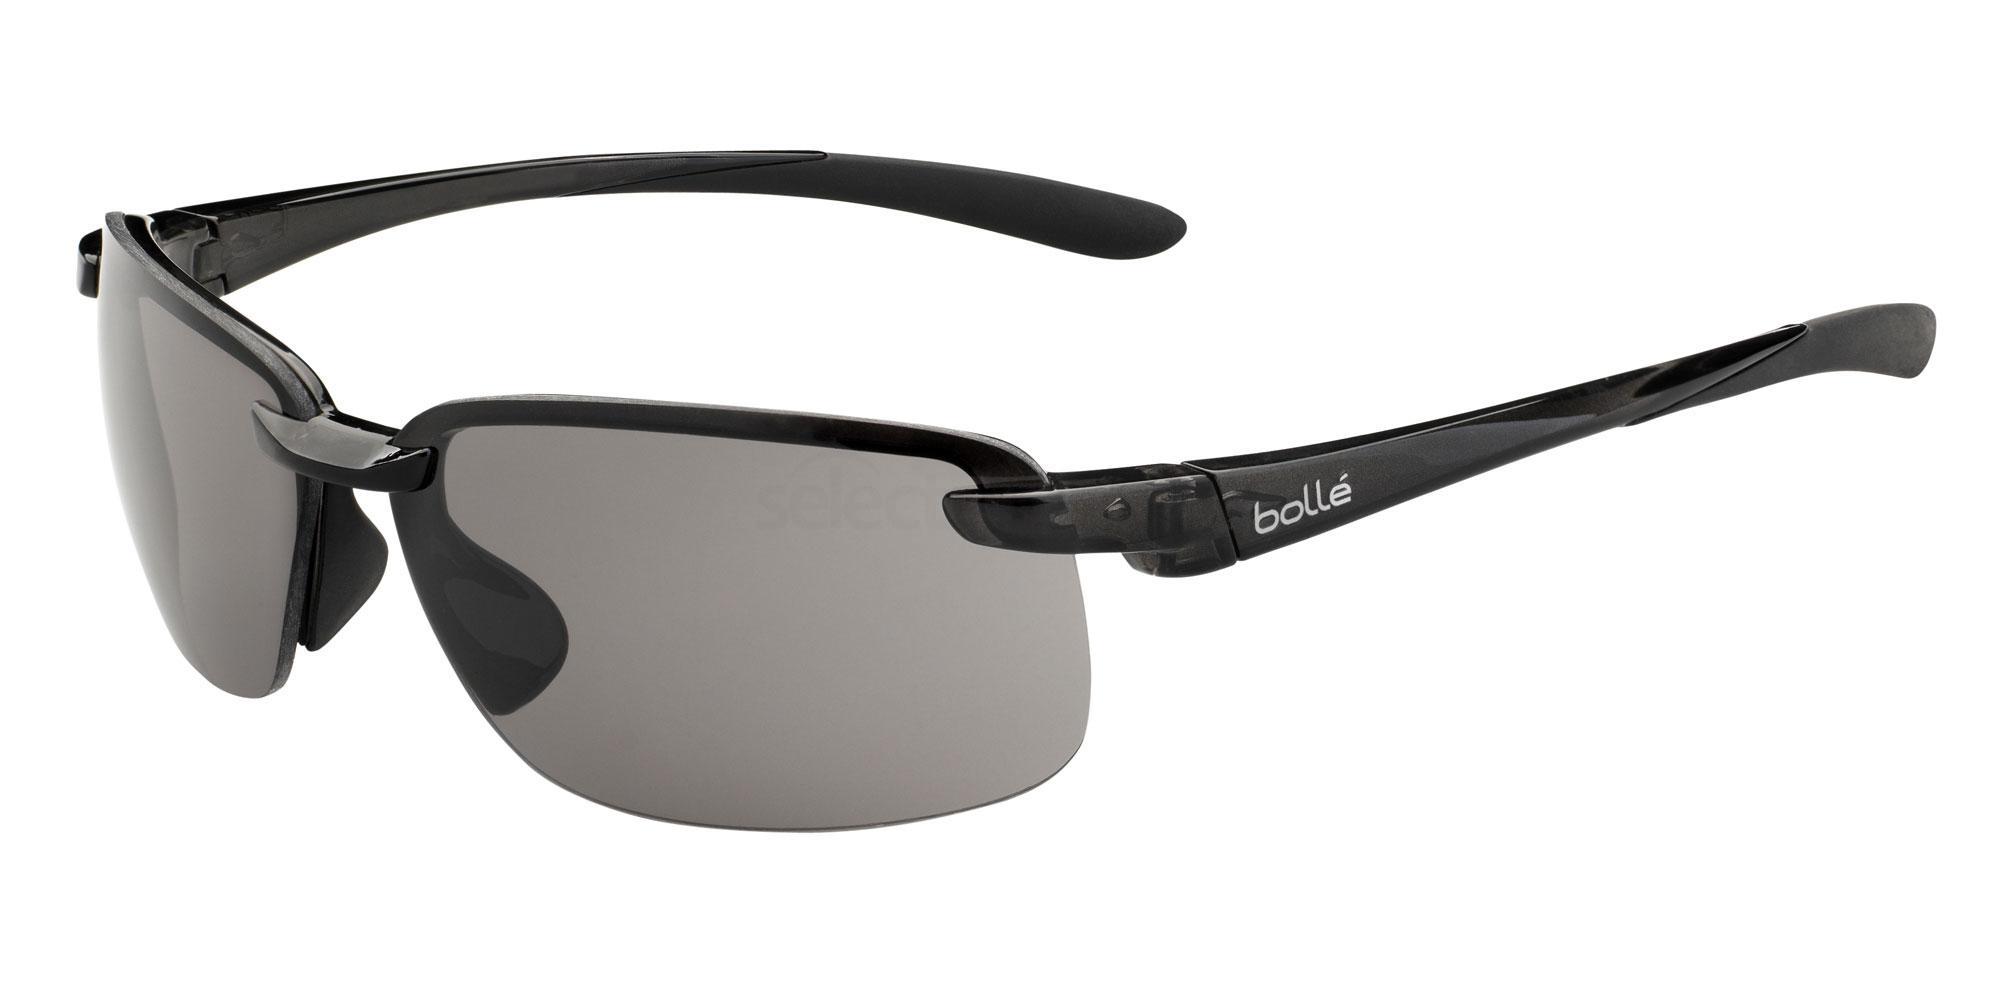 12258 Flyair Sunglasses, Bolle